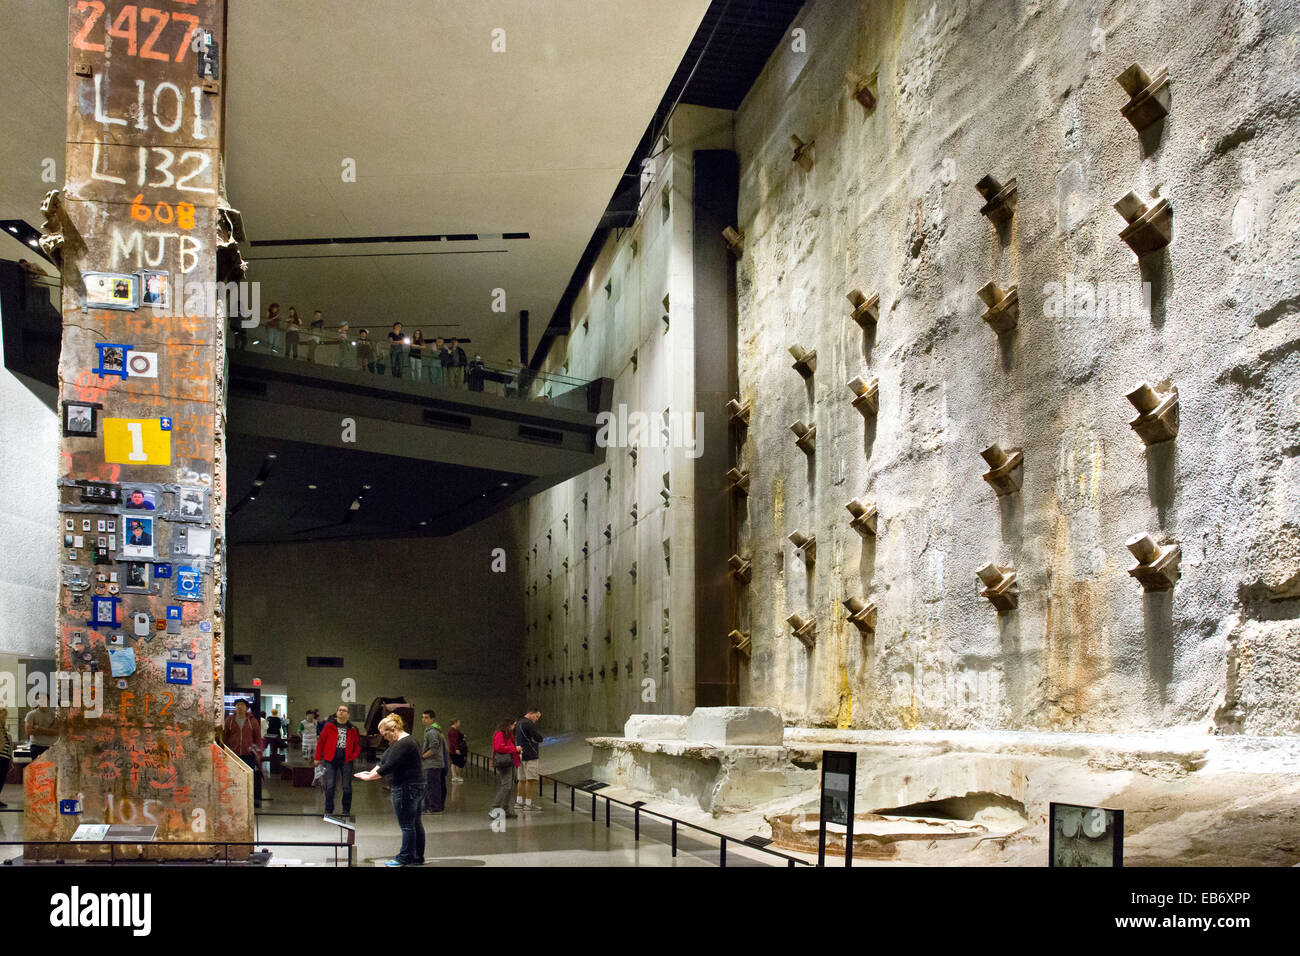 Foundation Hall of the National September 11 Memorial and MuseumNational September 11 Memorial and Museum, Manhattan, - Stock Image